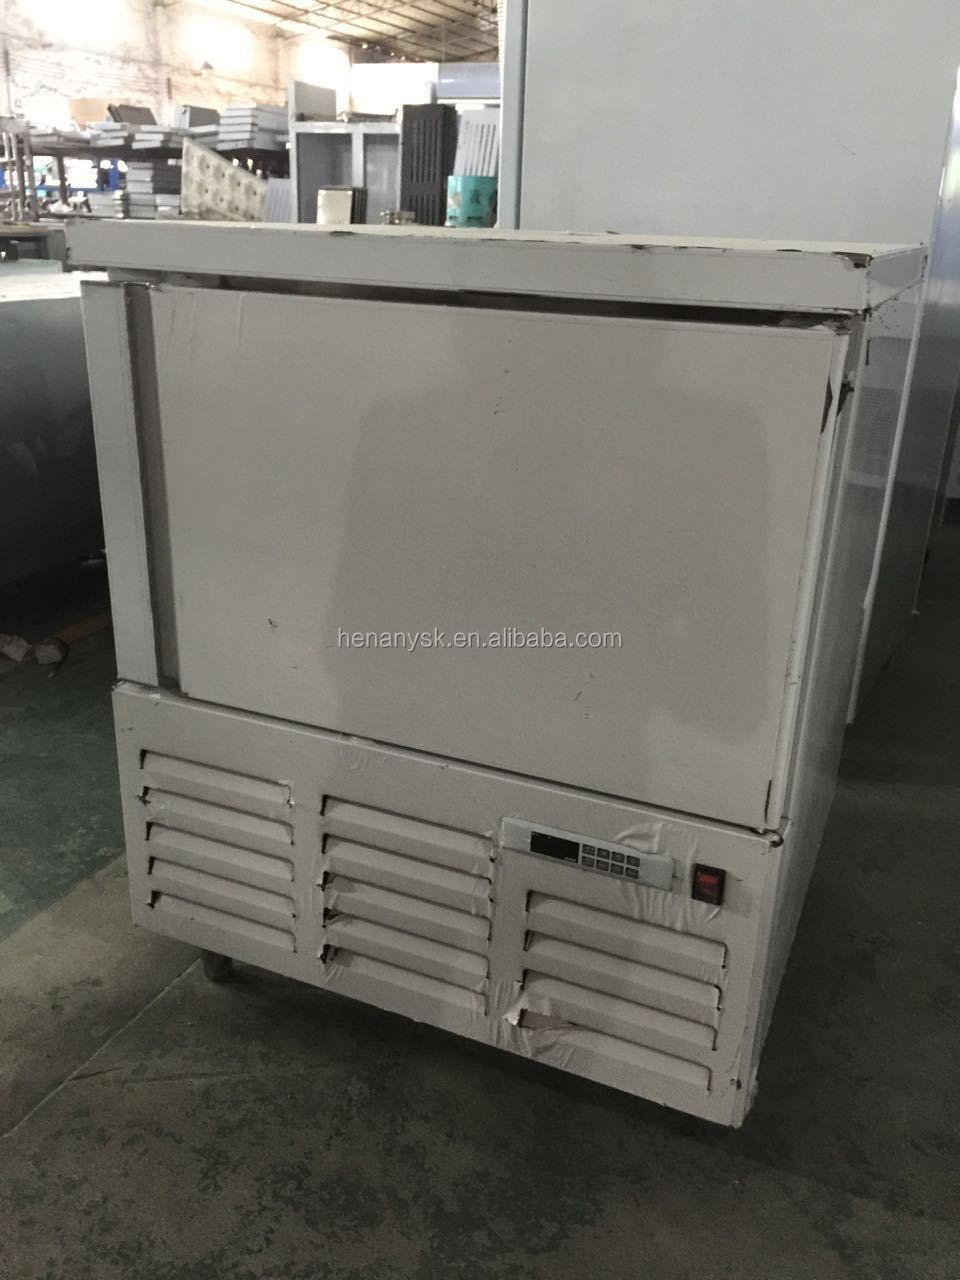 -35~3C Commercial Mobile Compressor Kitchen Chiller Shock Chicken Frozen Blast Freezer For Fish Meat